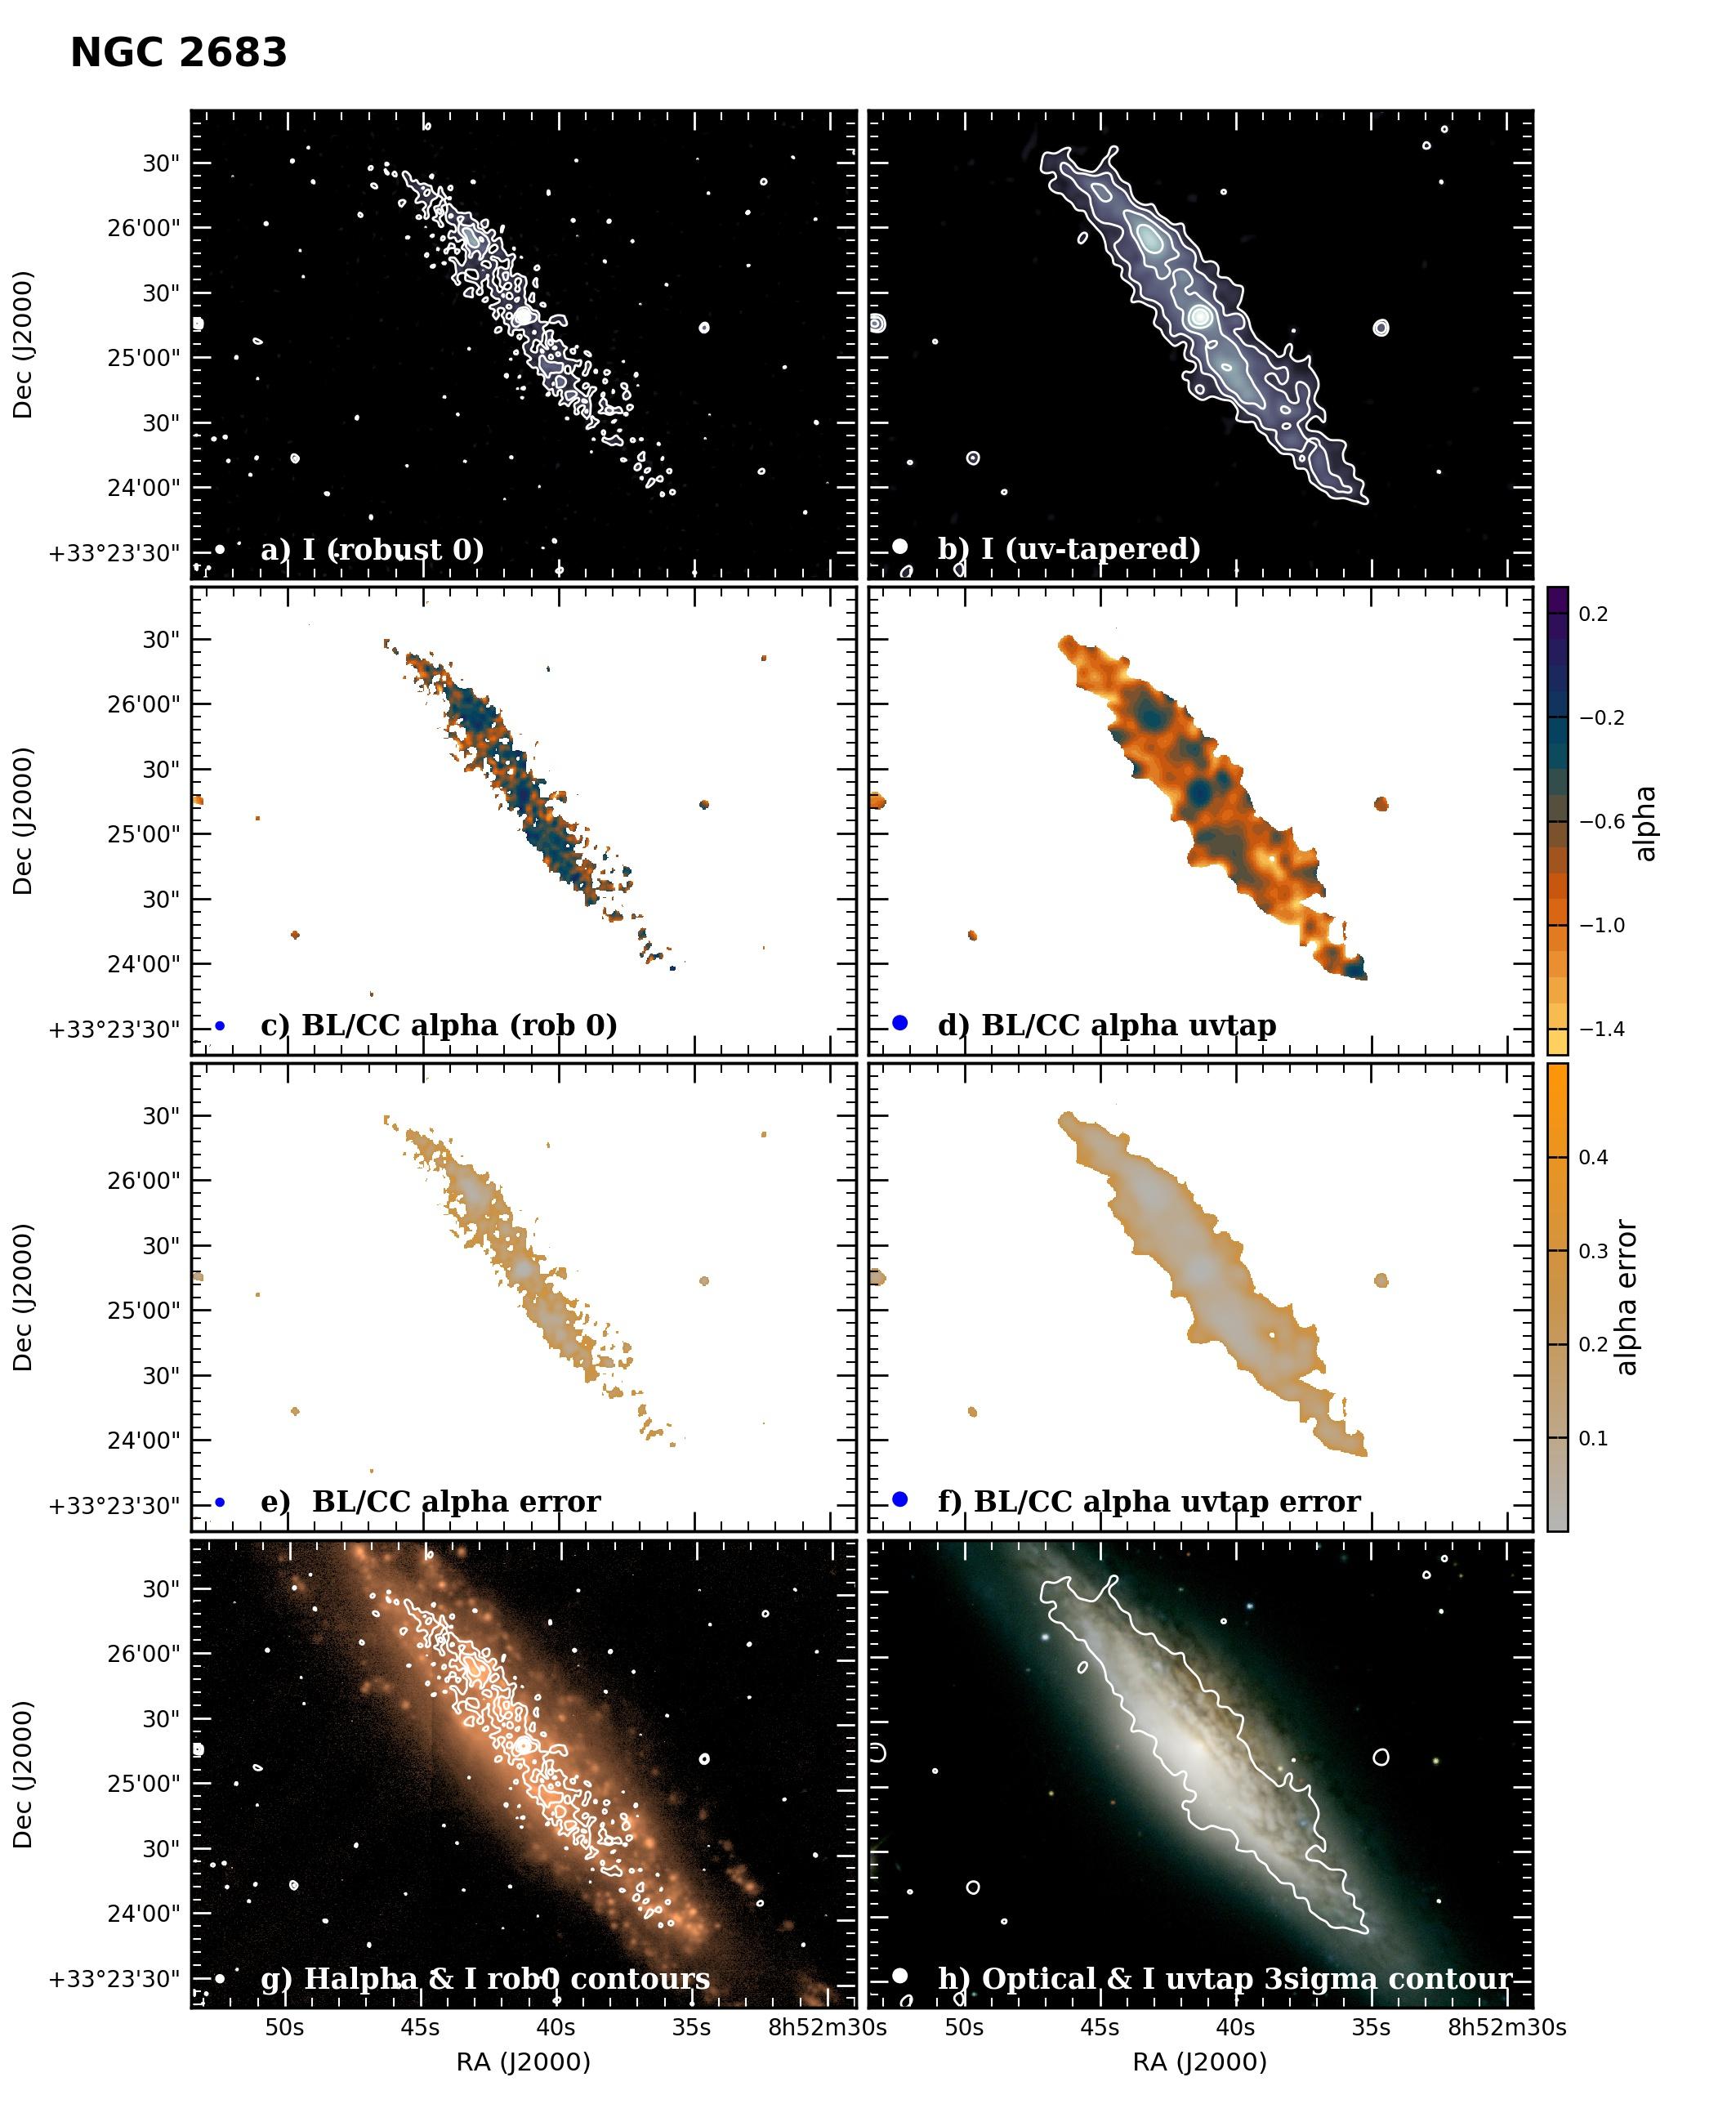 Panel image of NGC2683 from B configuration data release III (Irwin et al. 2019)